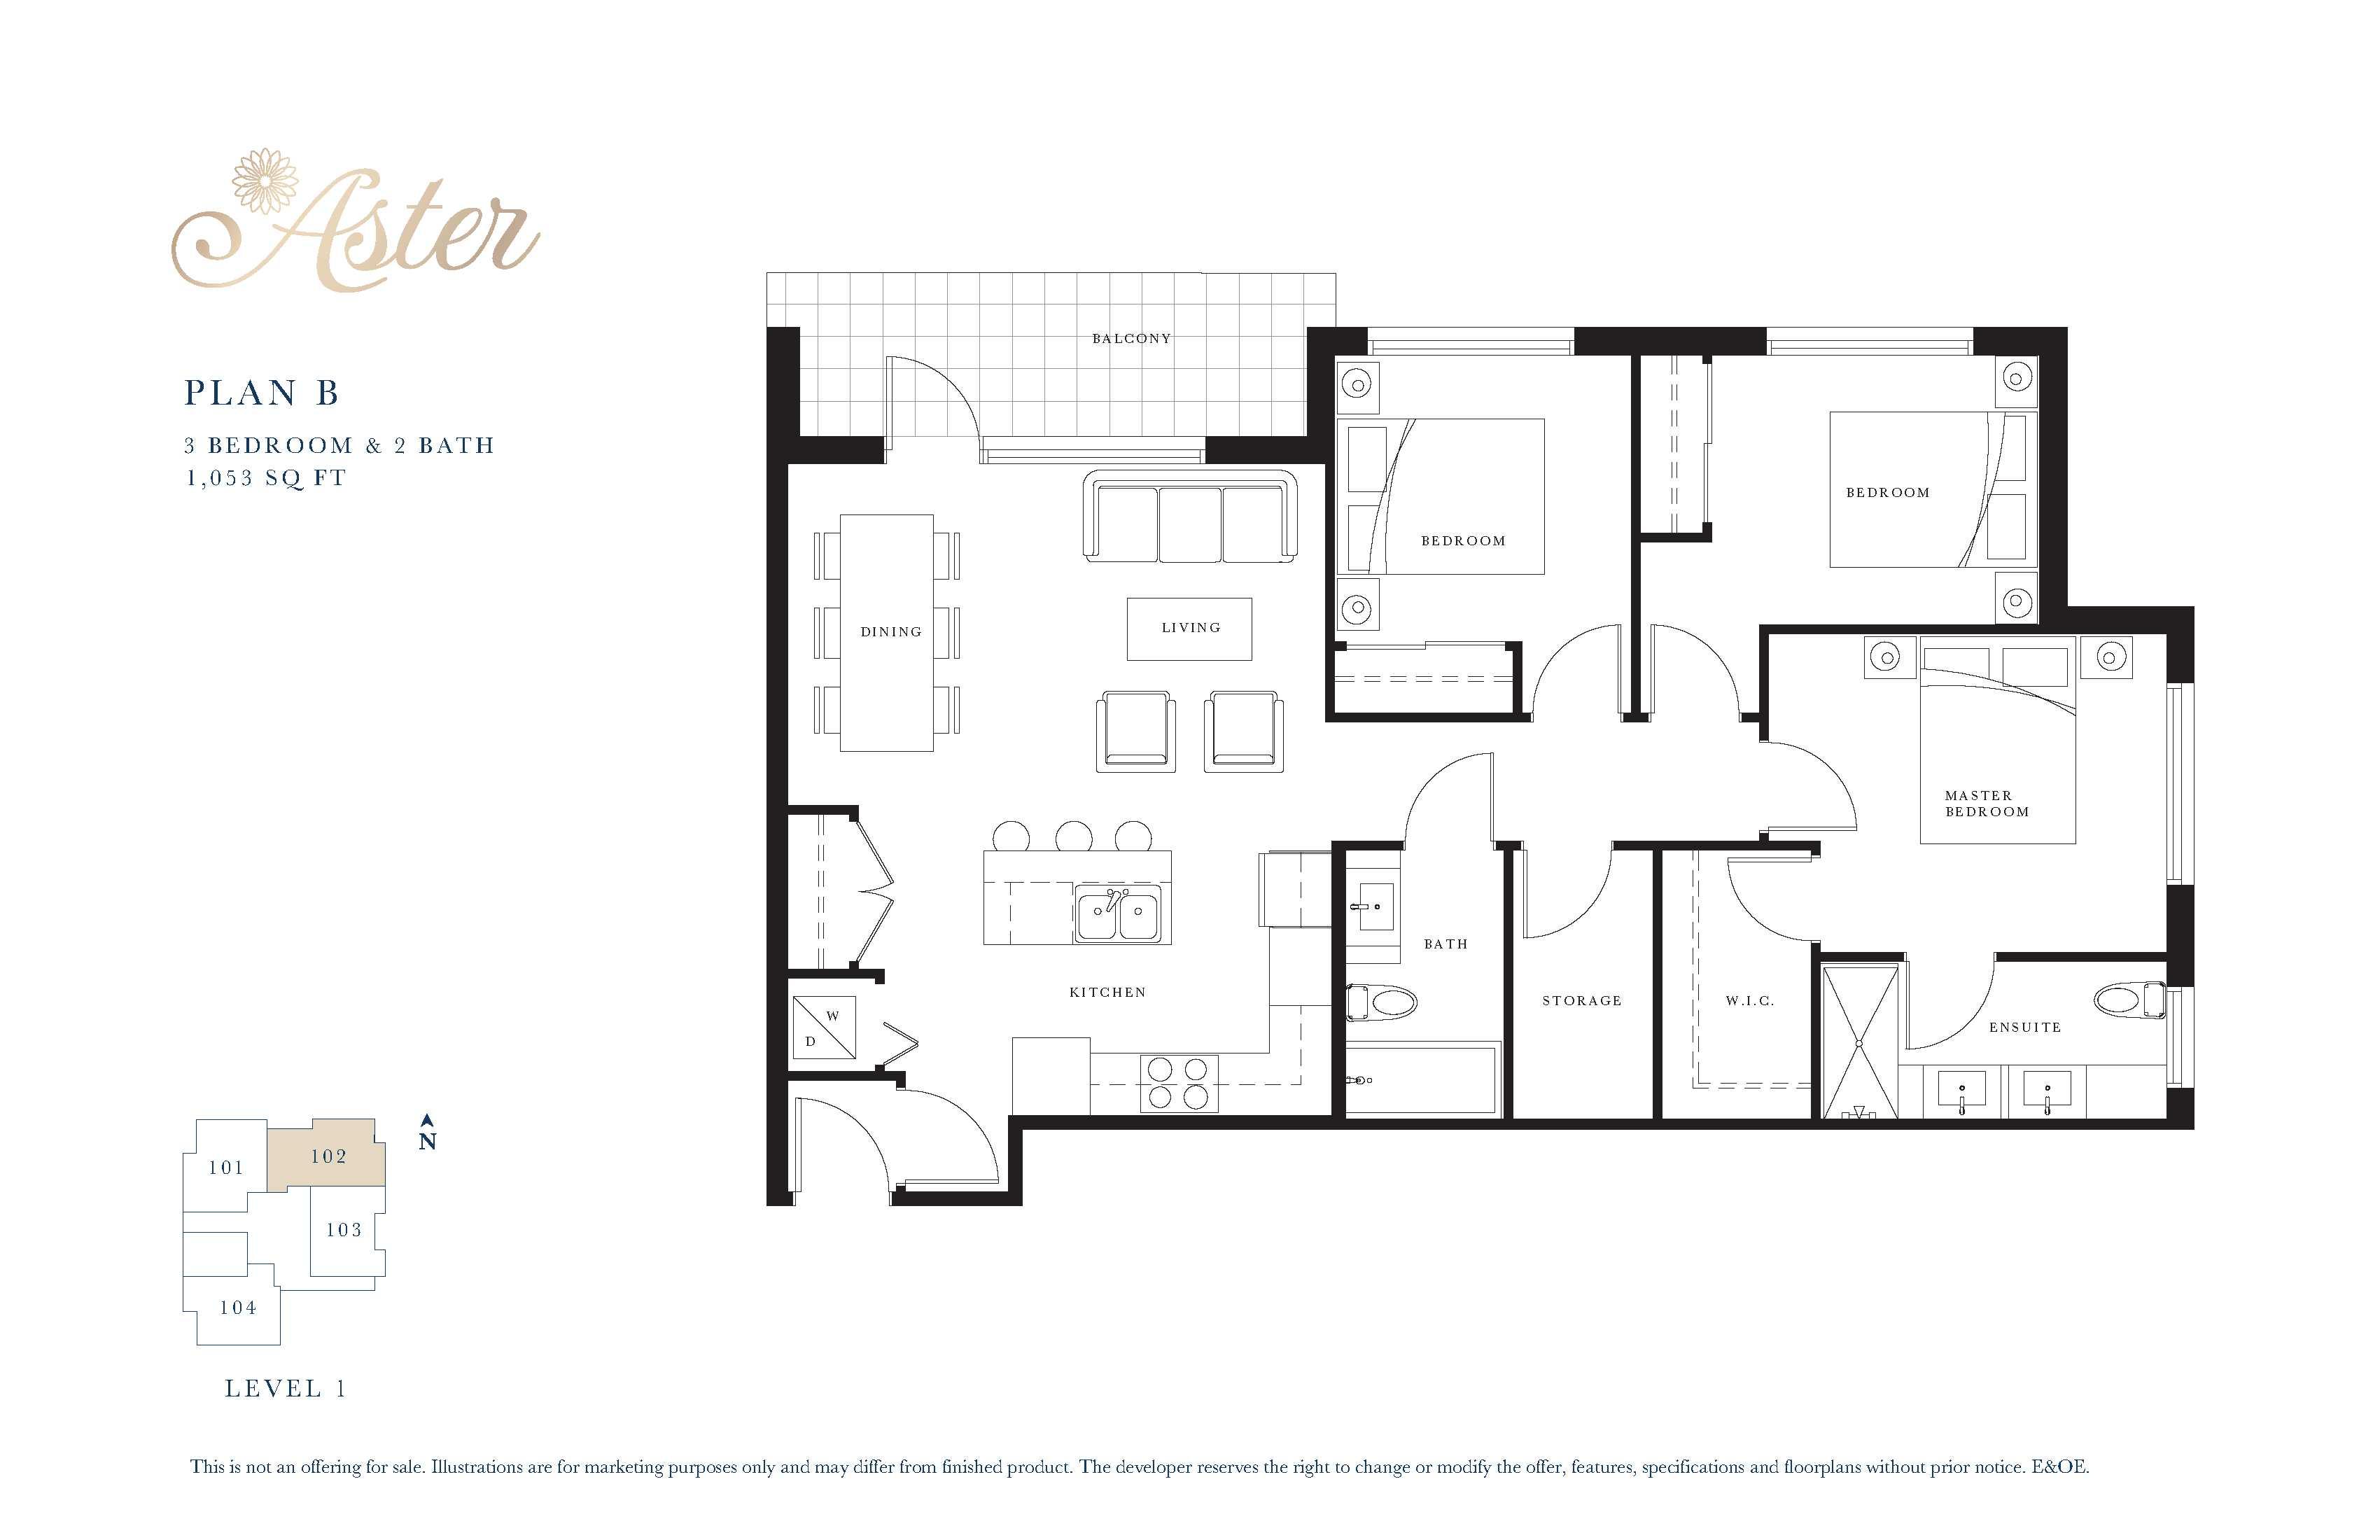 Plan B 3 BED & 2 BATH 1053 SQFT